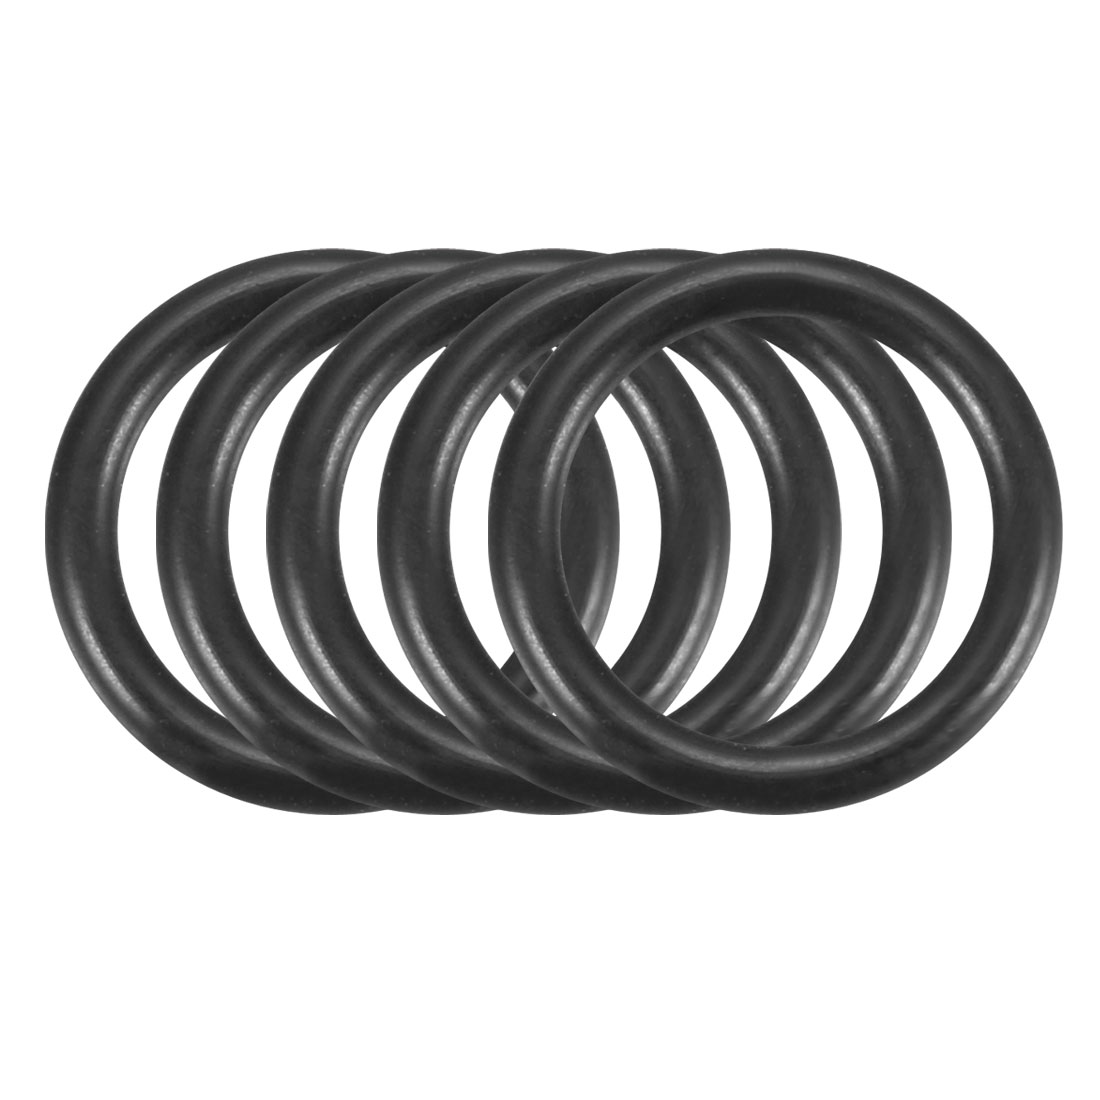 100Pcs Black 11.5mm x 1.5mm Nitrile Rubber O Ring NBR Oil Sealing Grommets